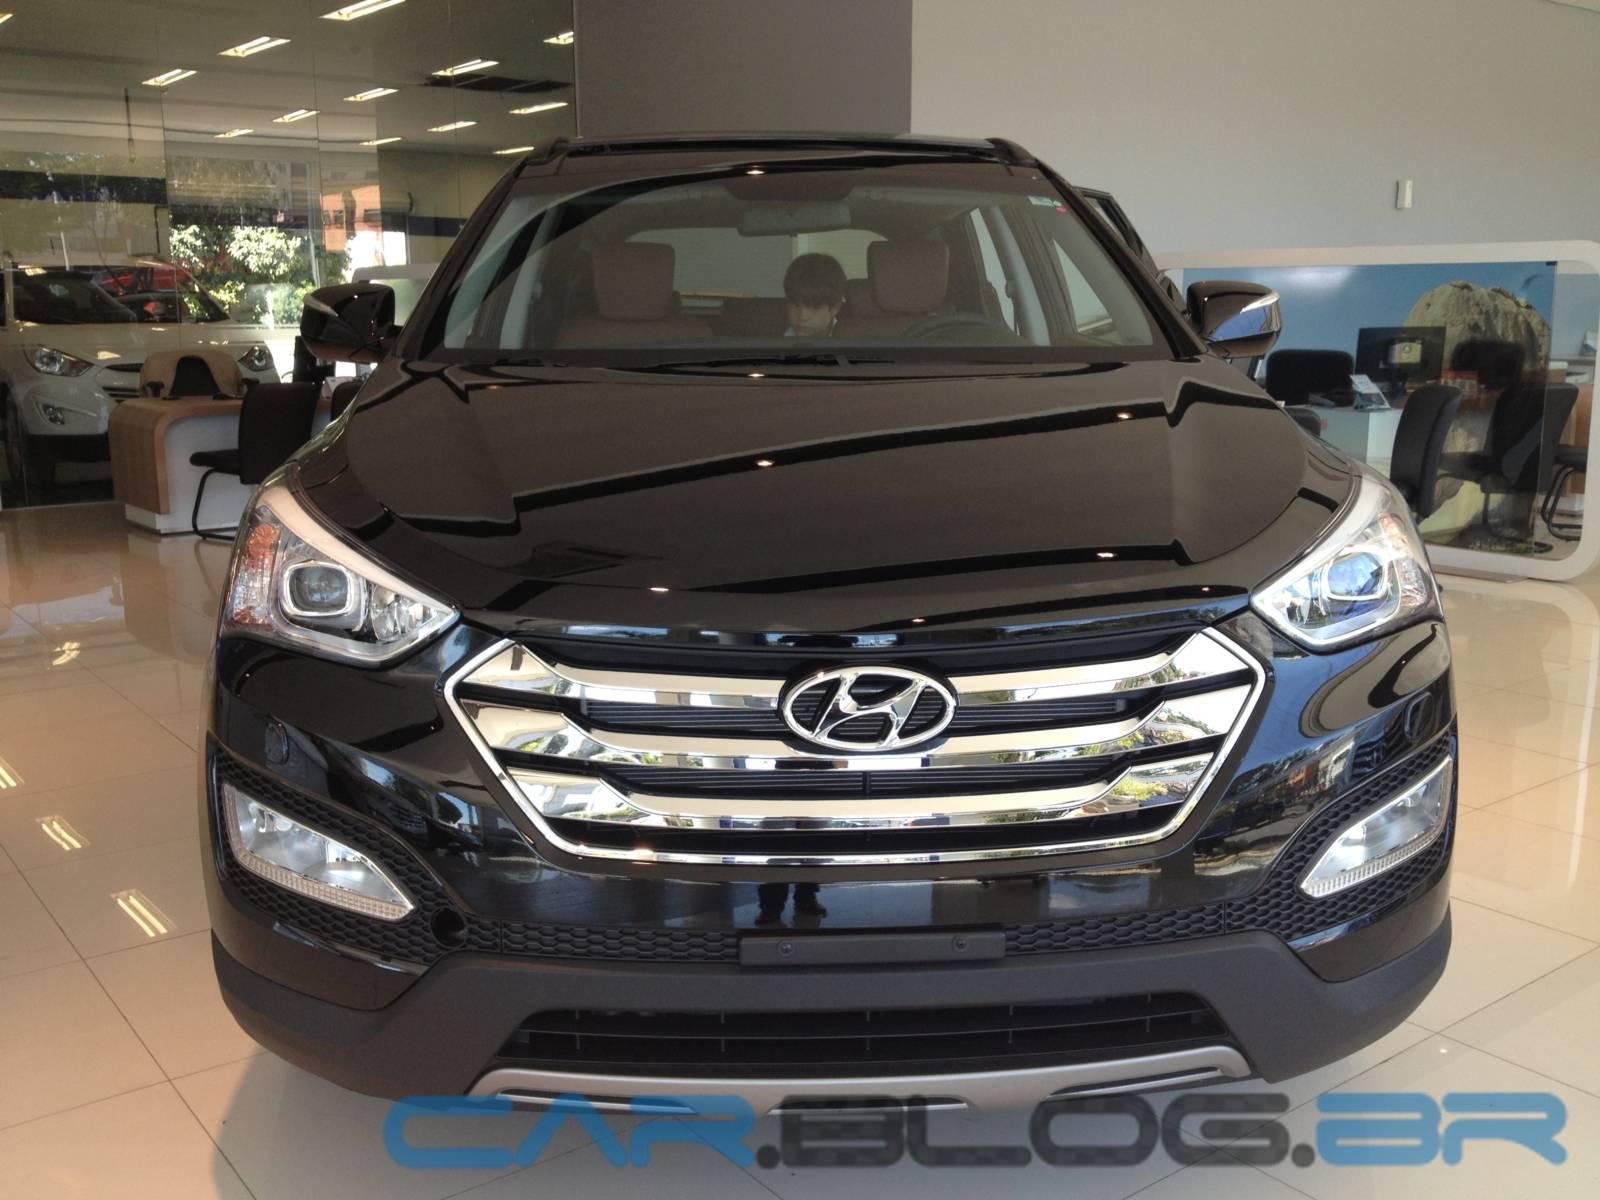 Novo Hyundai Santa Fé 2014   7 Lugares   Preta